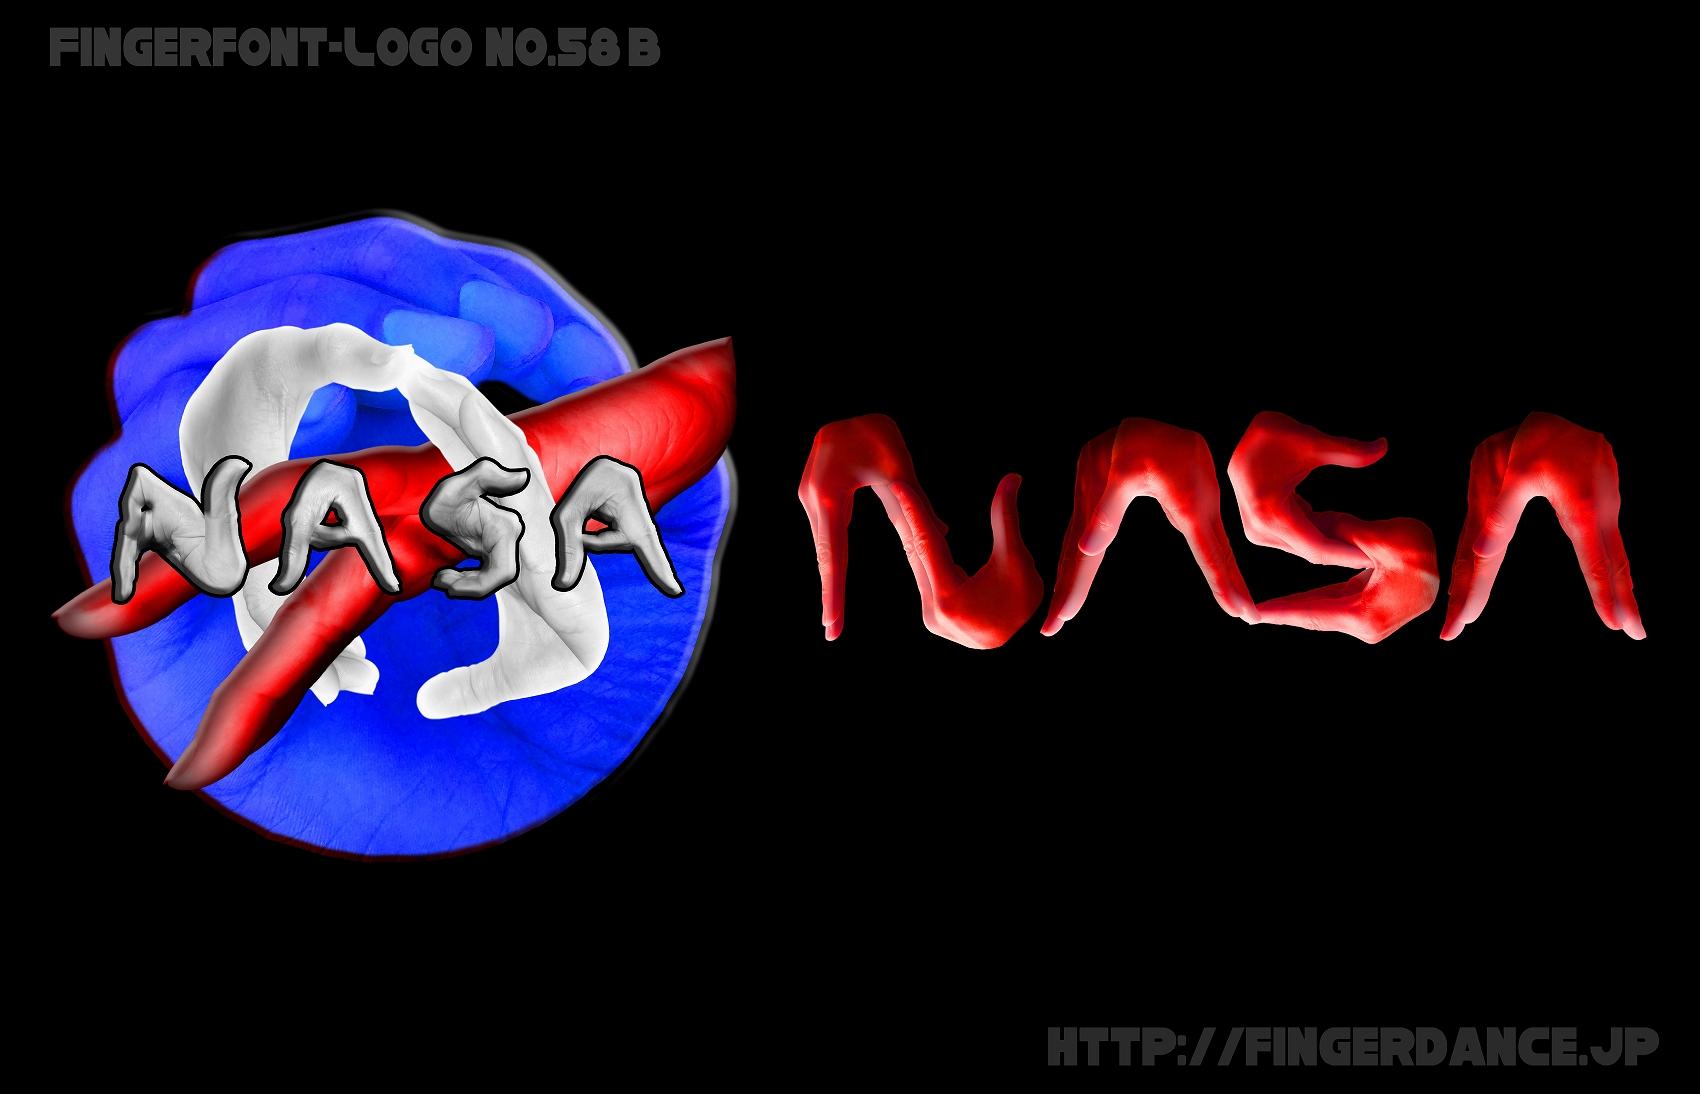 NASA-ナサフィンガーロゴハンド手指